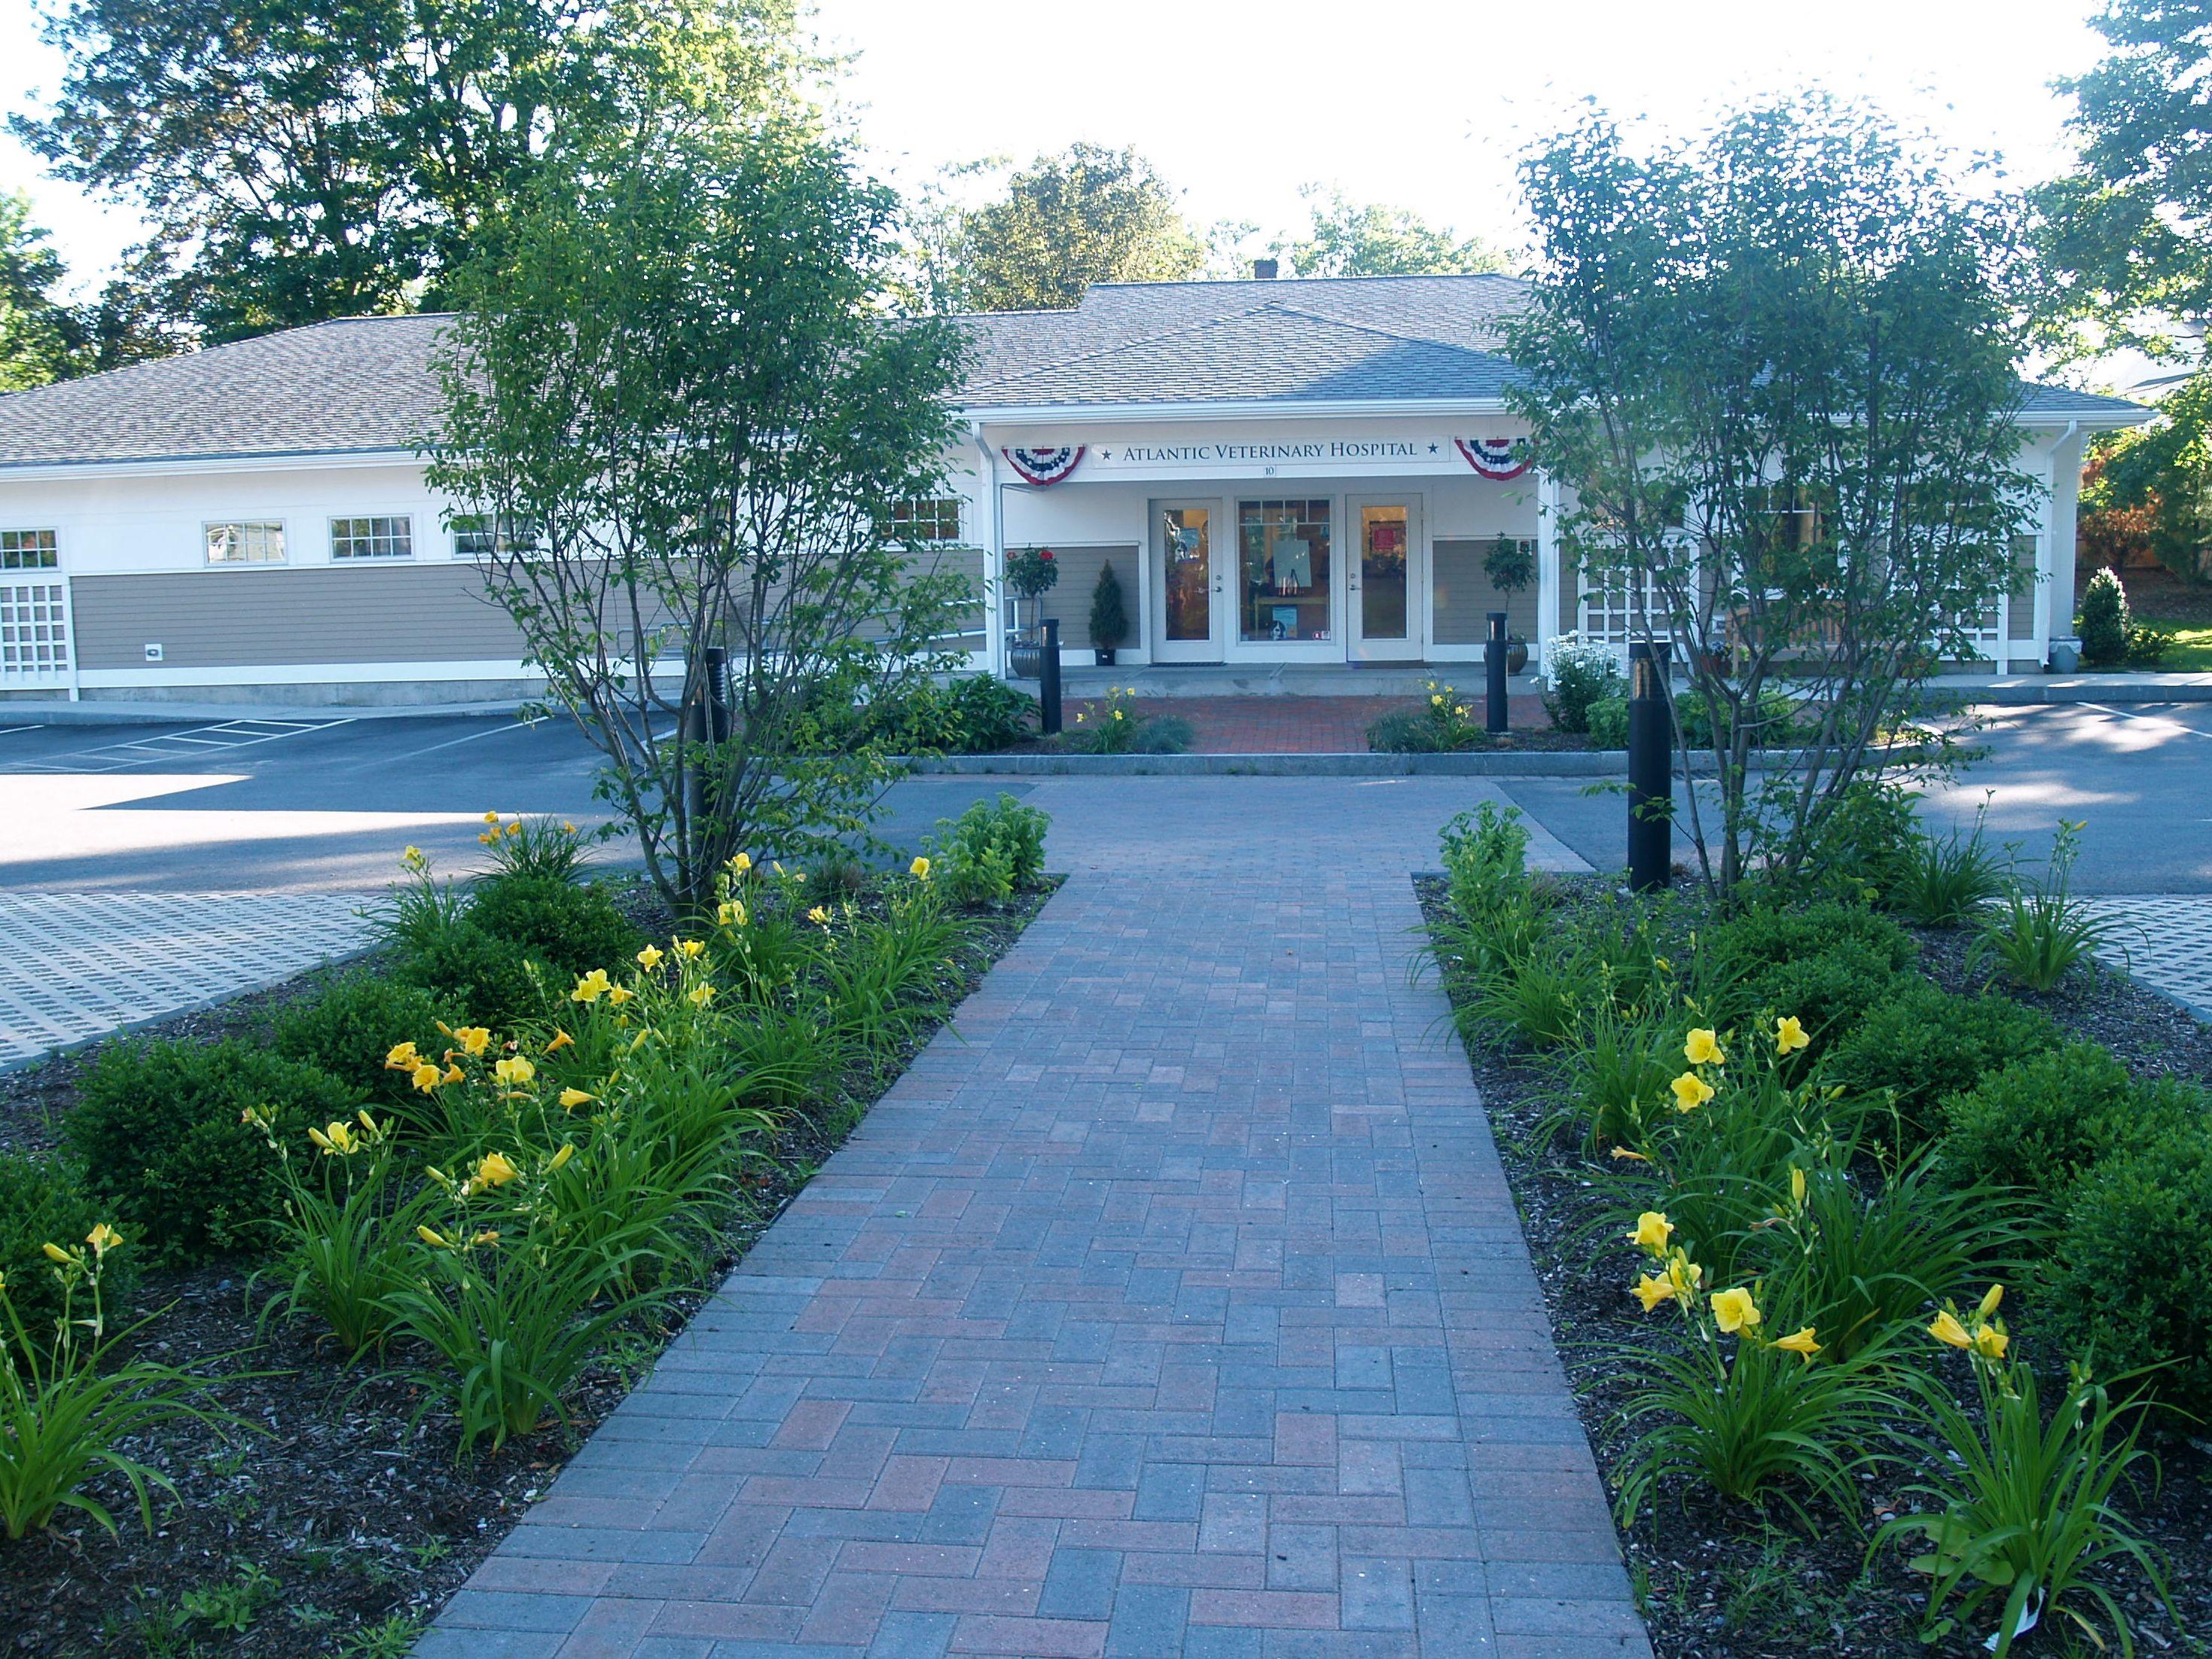 Atlantic Veterinary Hospital Commercial landscaping